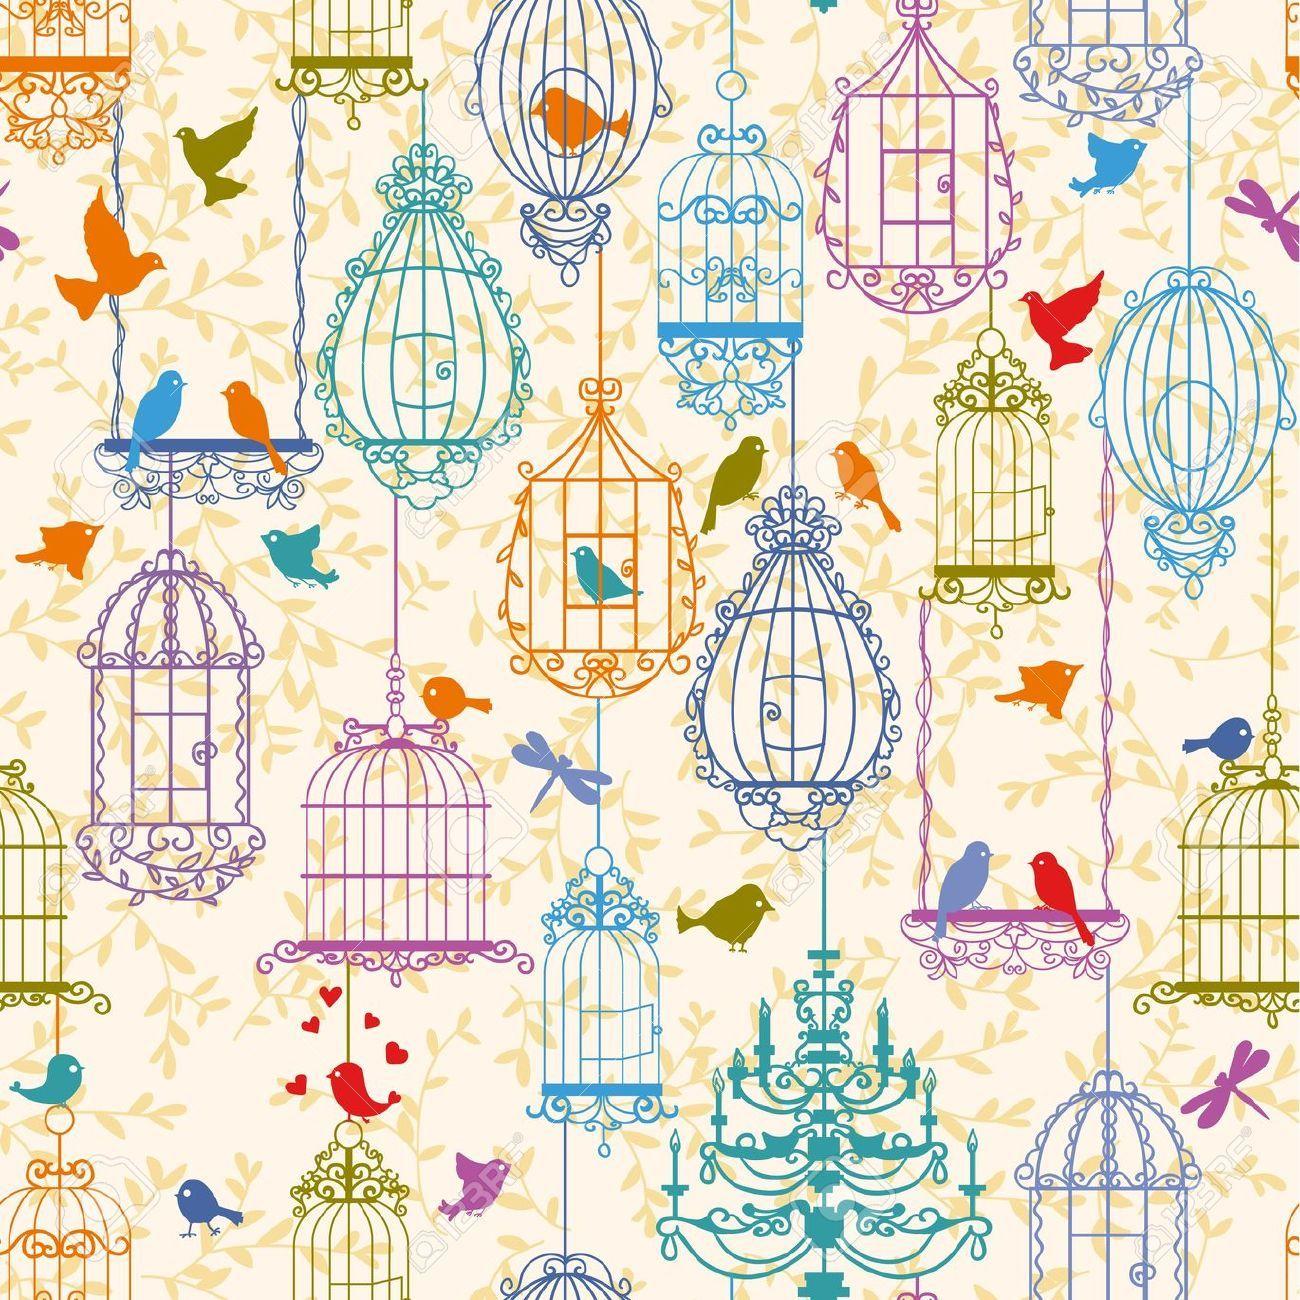 bird illustration wallpaper wwwpixsharkcom images